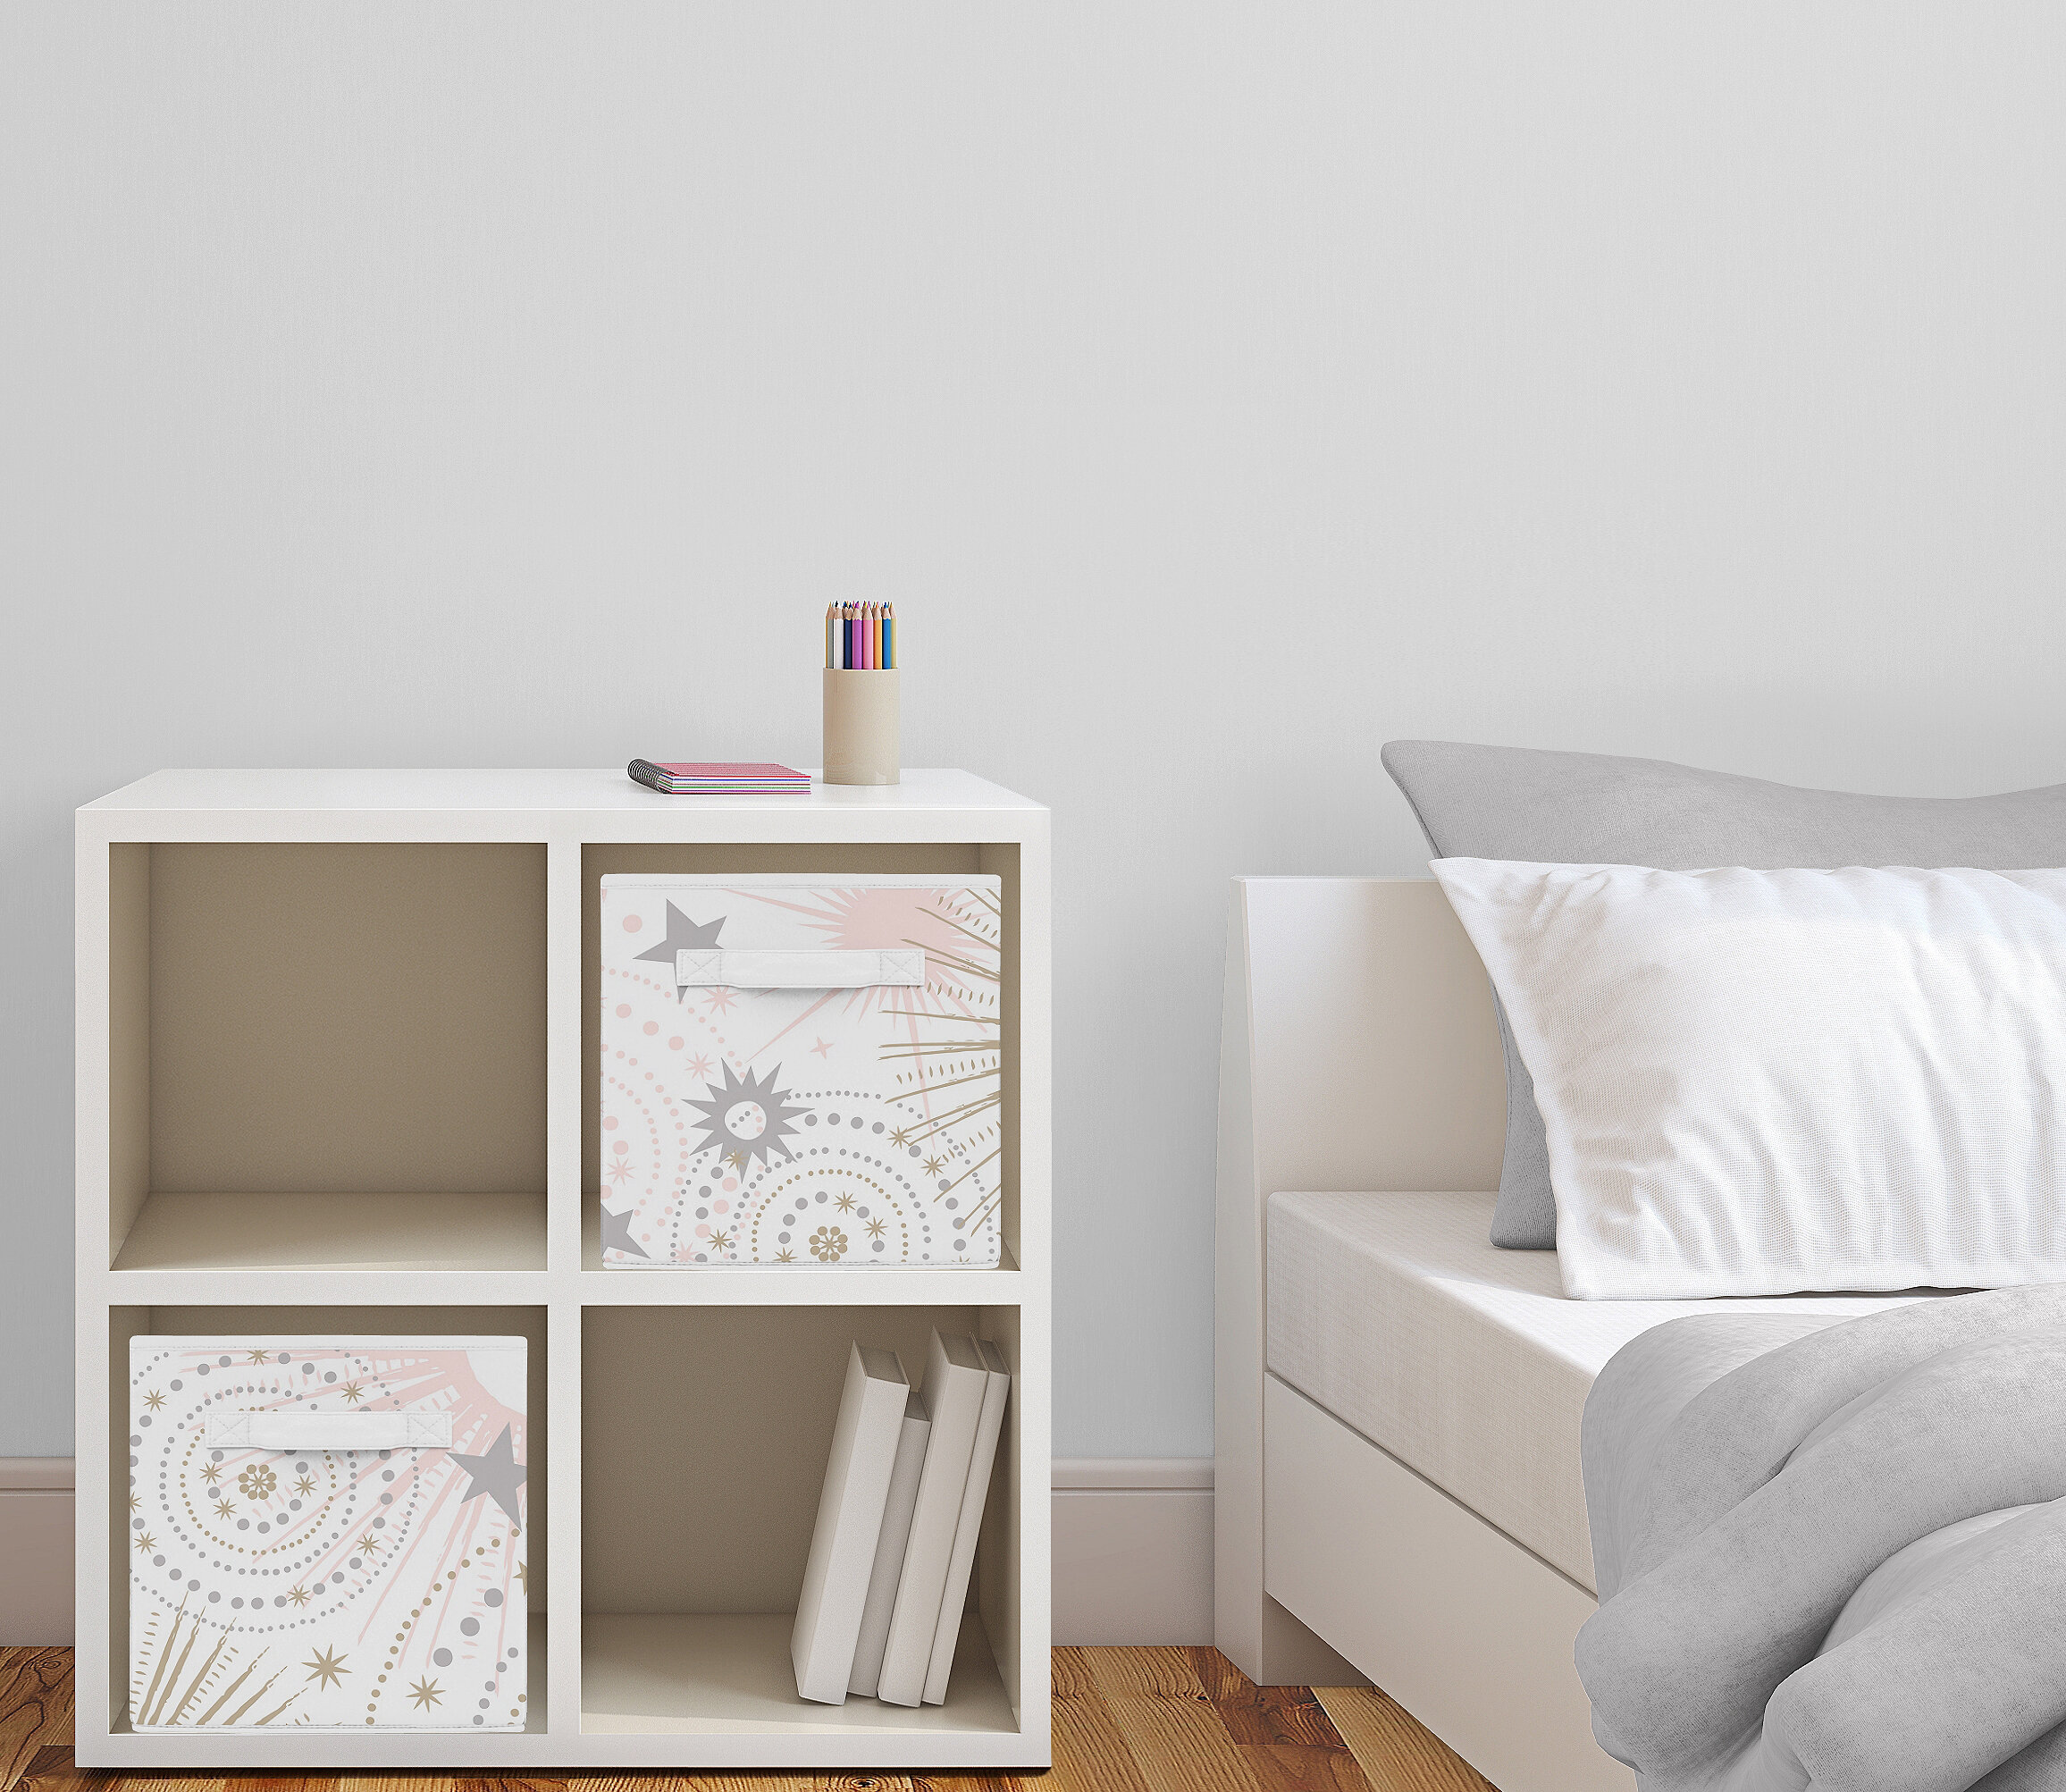 Sweet Jojo Designs Celestial Fabric Storage Bin Reviews Wayfair